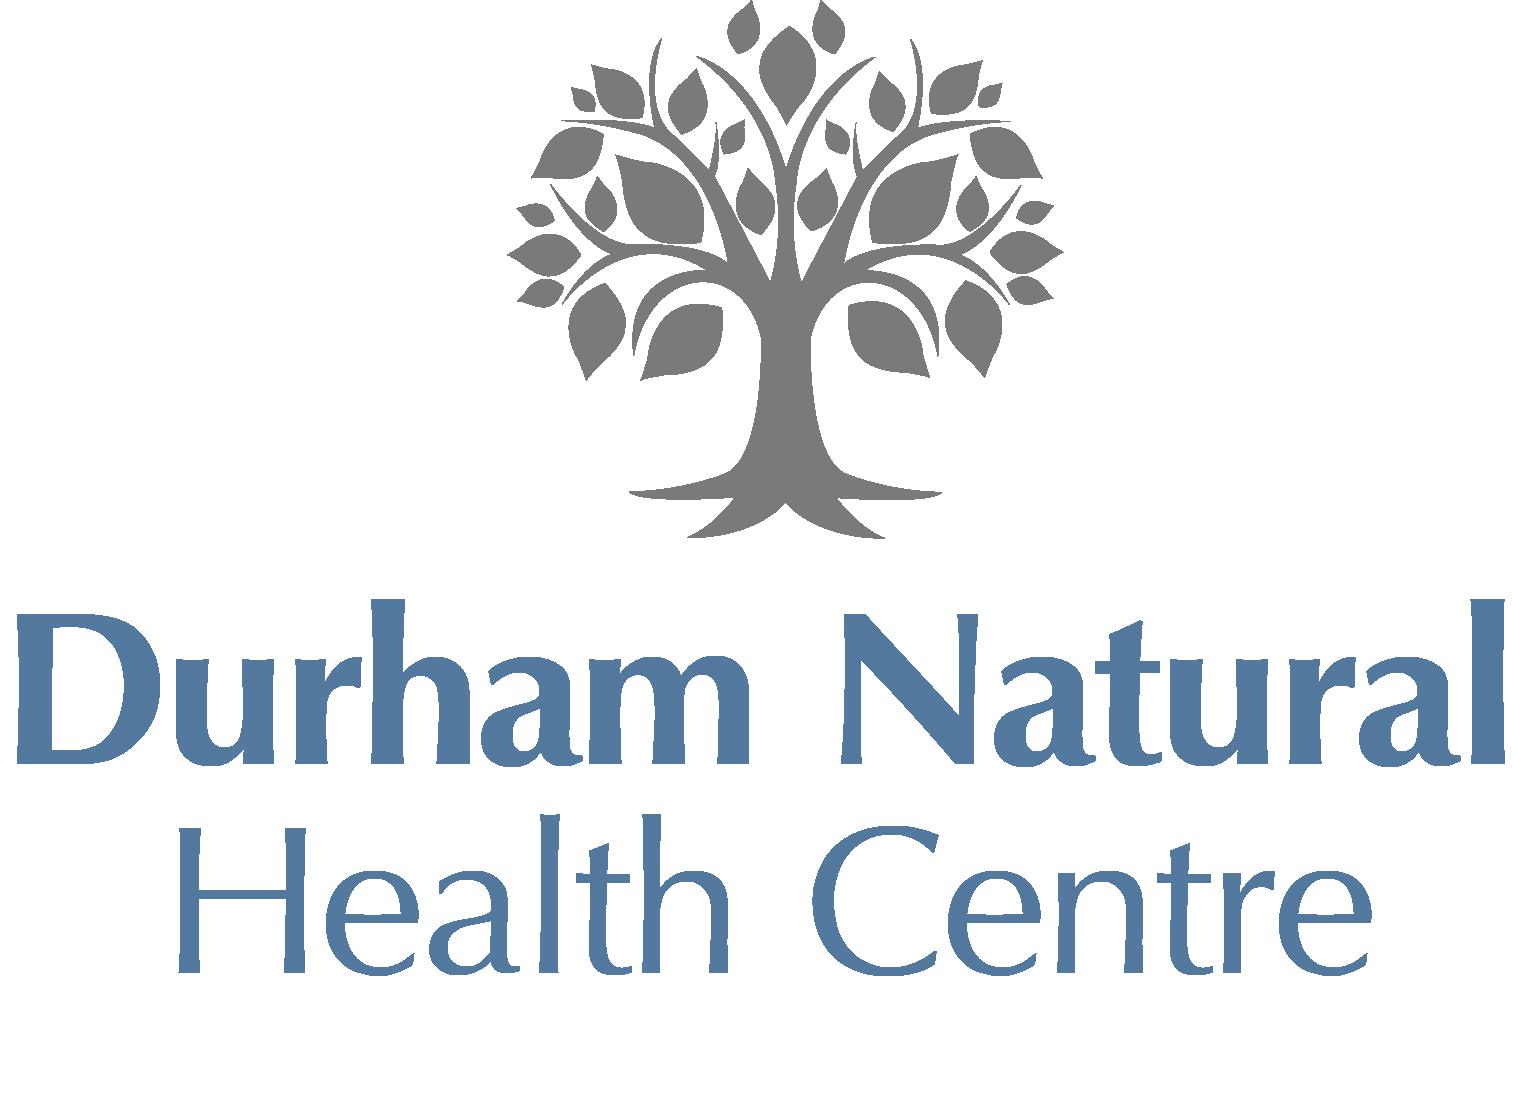 Durham Natural Health Centre - Naturopathic Medicine | Ajax